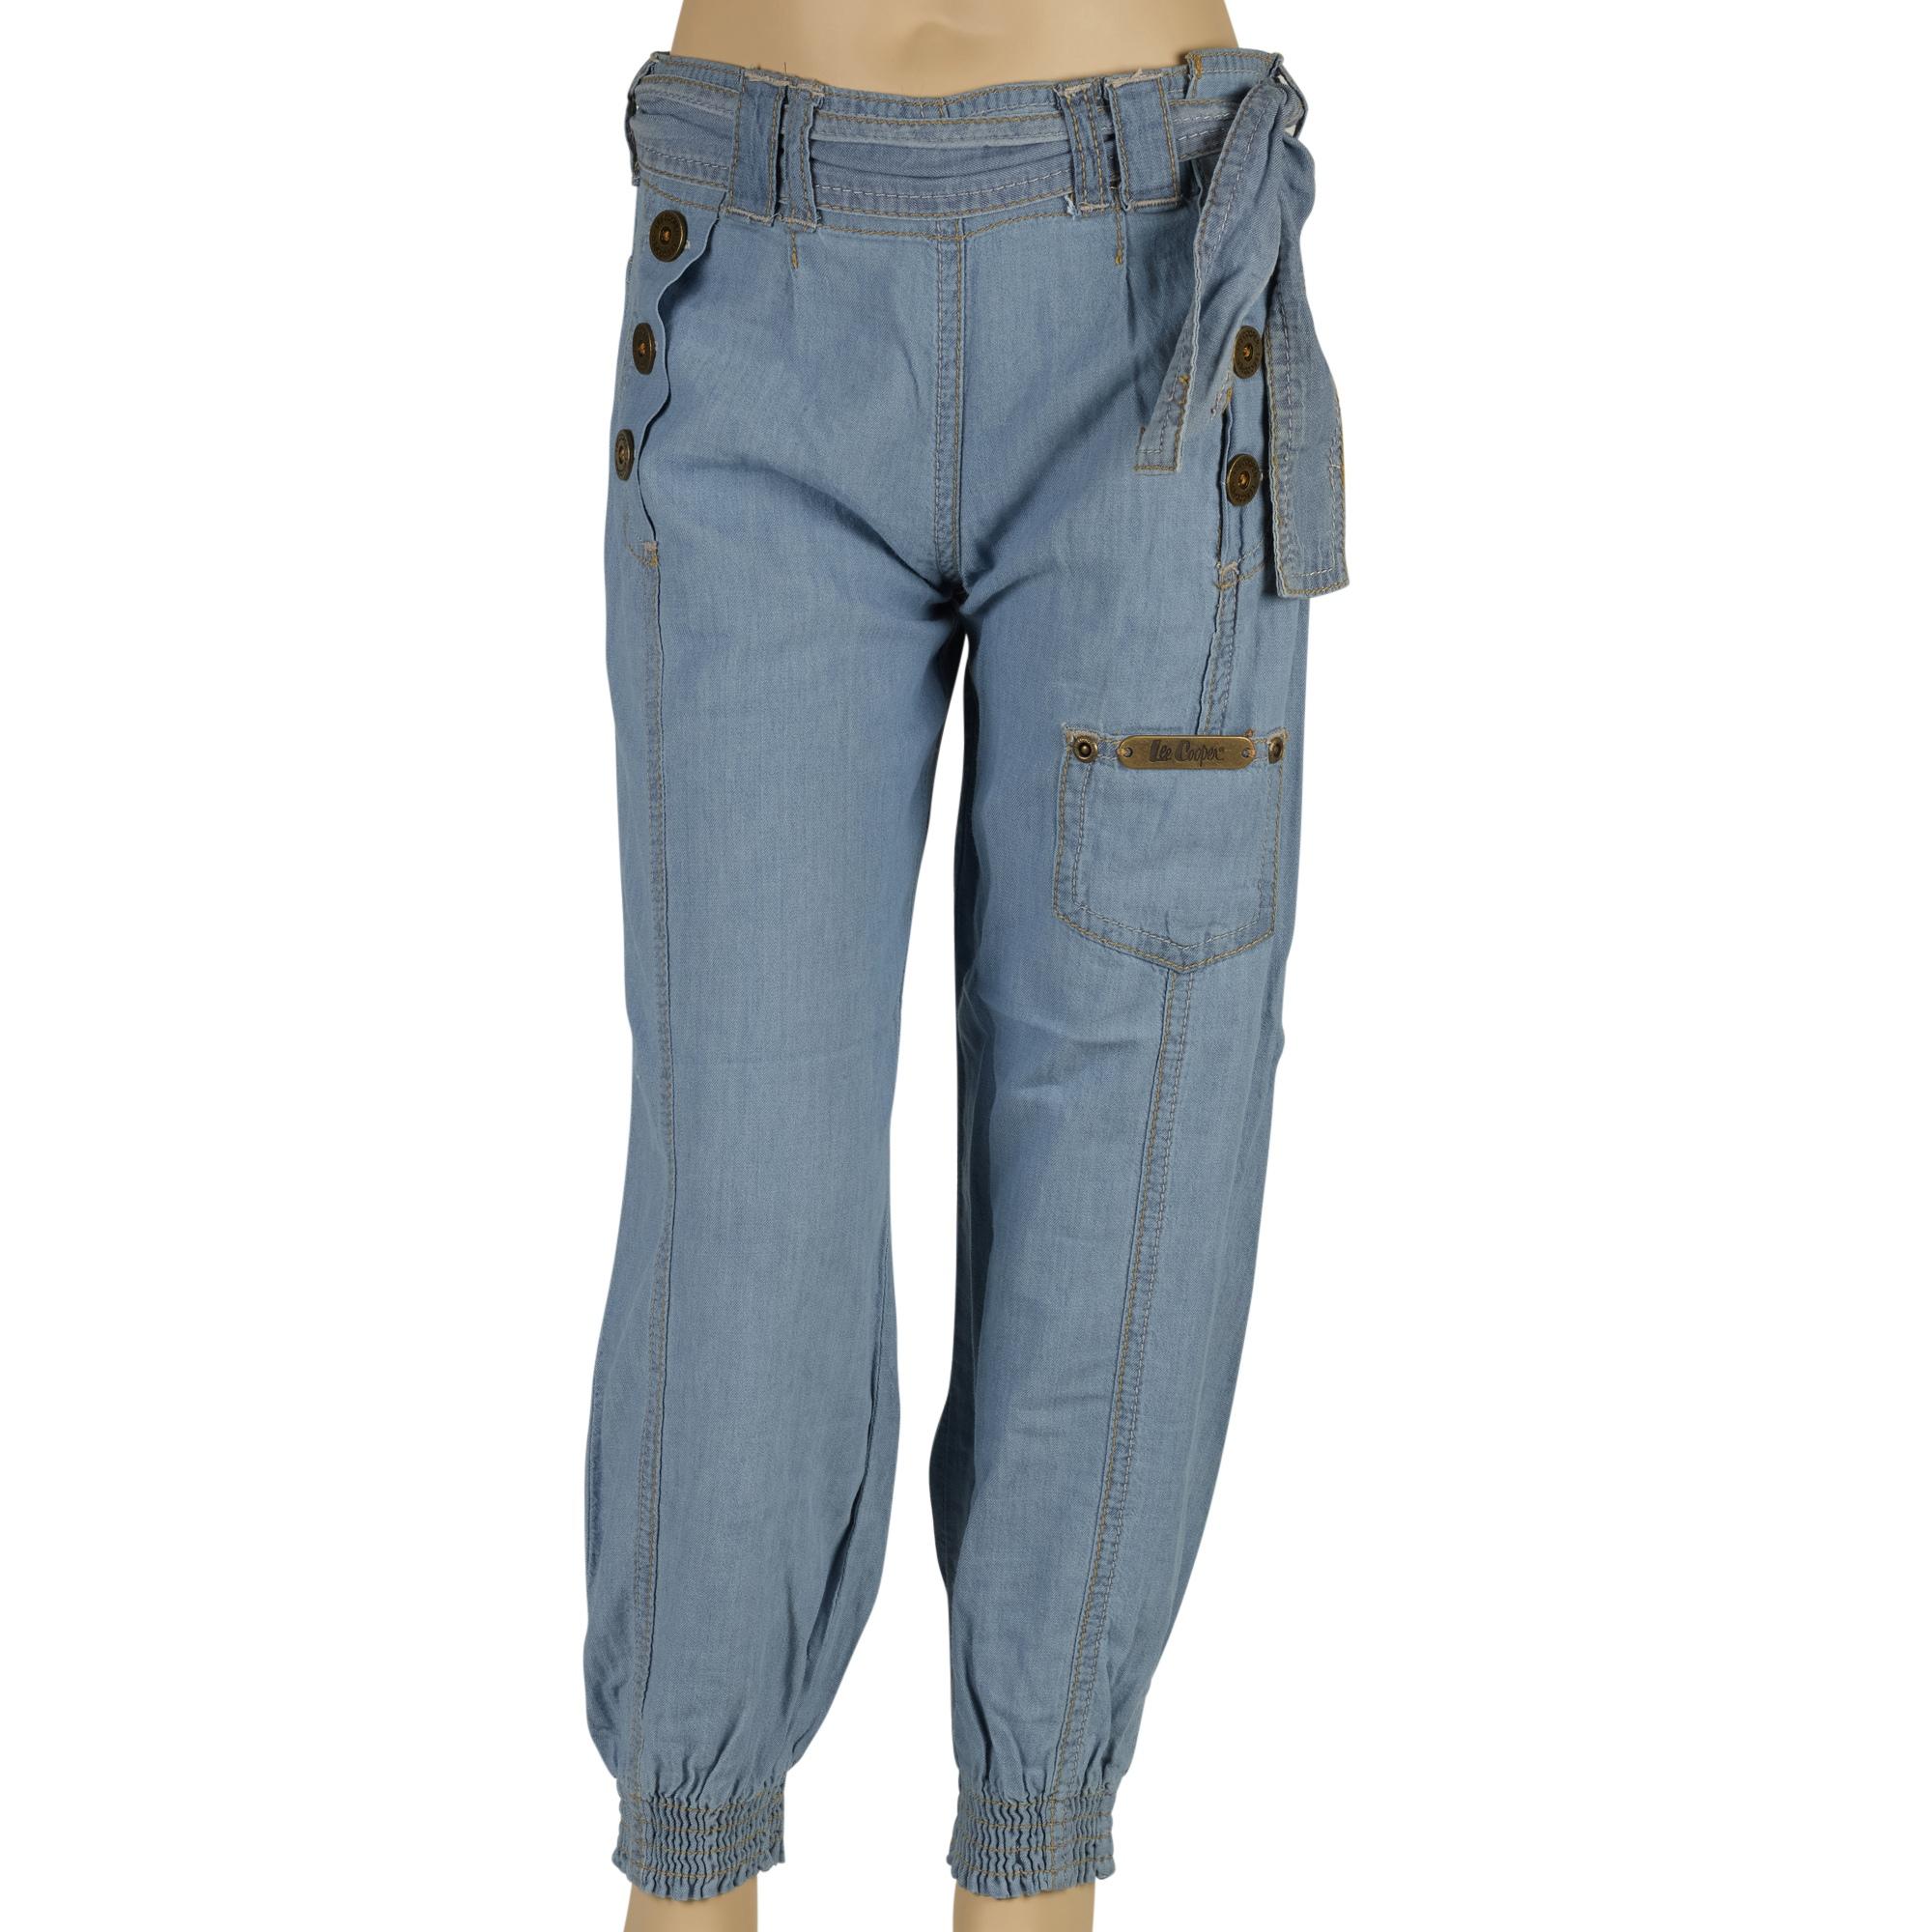 girls lee cooper designer denim jeans casual fashion trousers pants cuffed ankle ebay. Black Bedroom Furniture Sets. Home Design Ideas